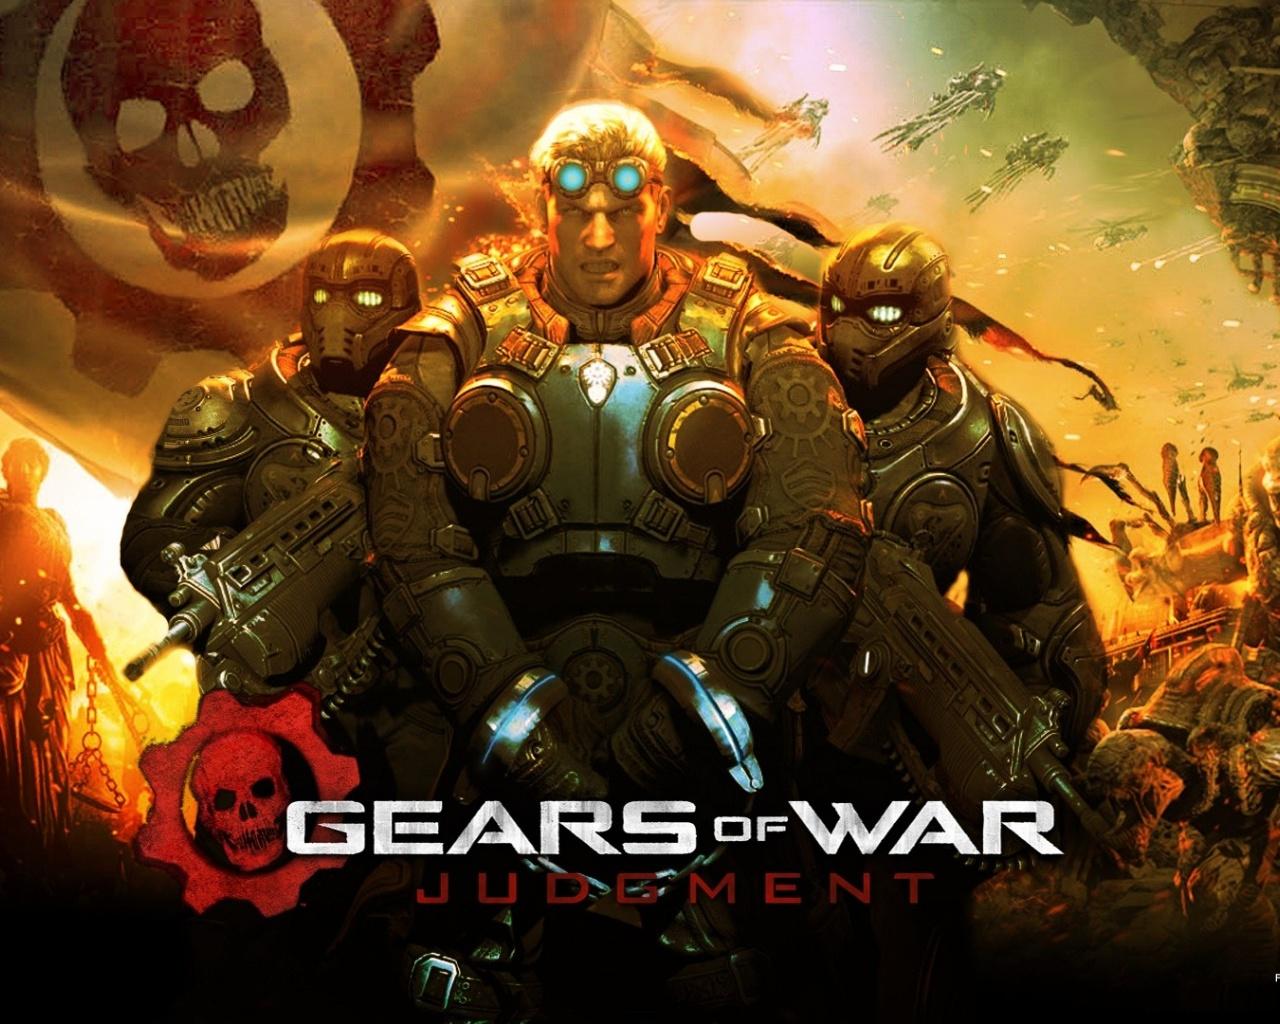 1280x1024 2013 Gears of War Judgment Gam desktop PC and Mac wallpaper 1280x1024